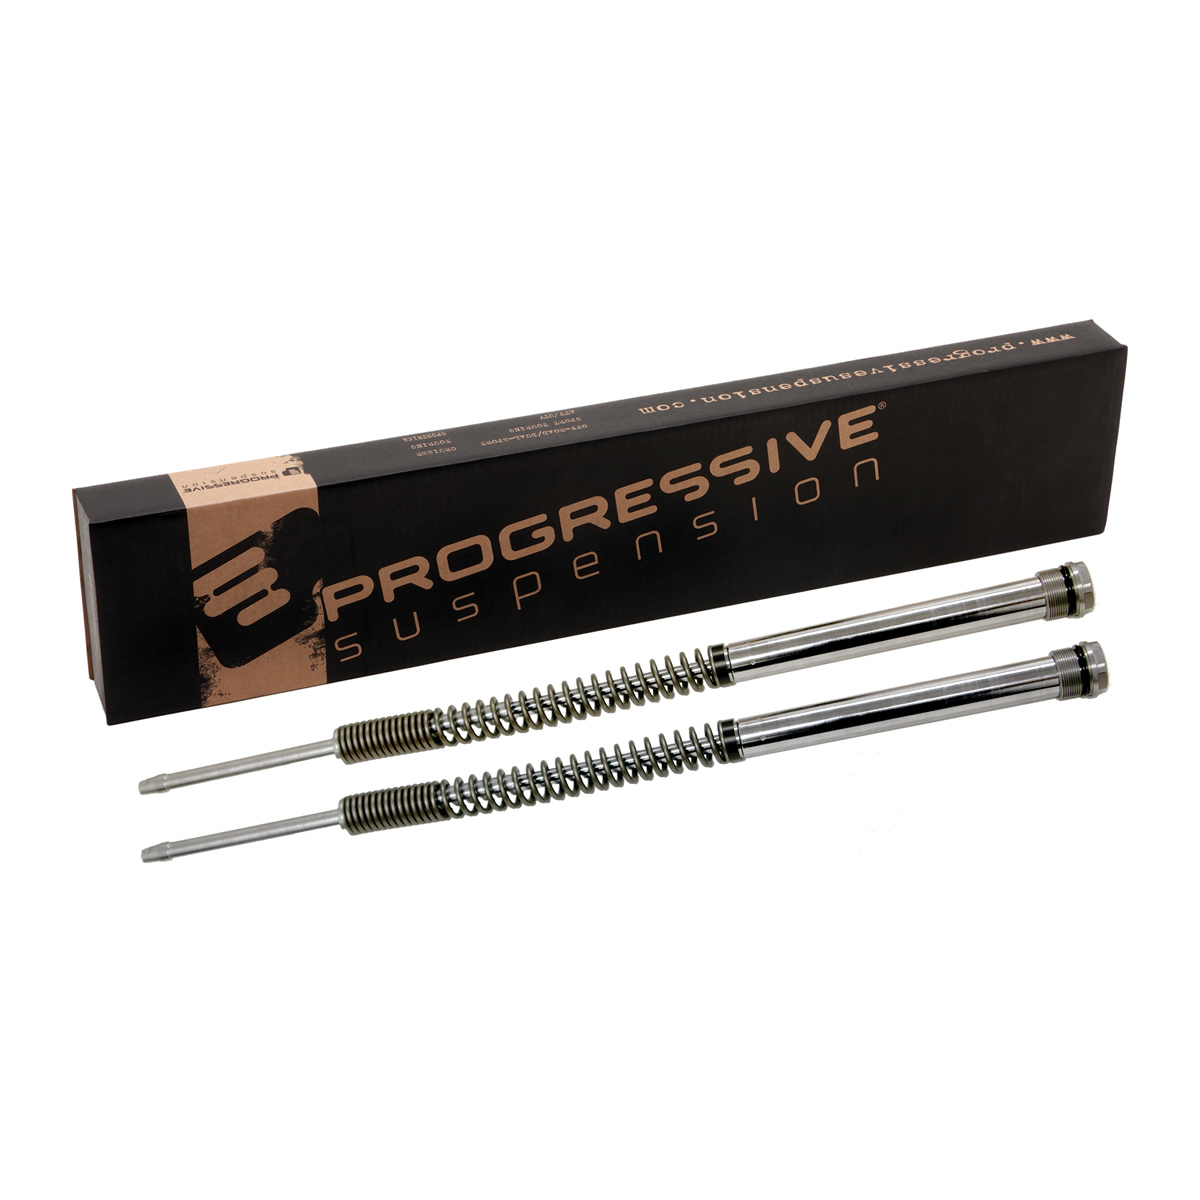 Progressive Suspension Fork Cartridge Kit (1″ & 2″ low)